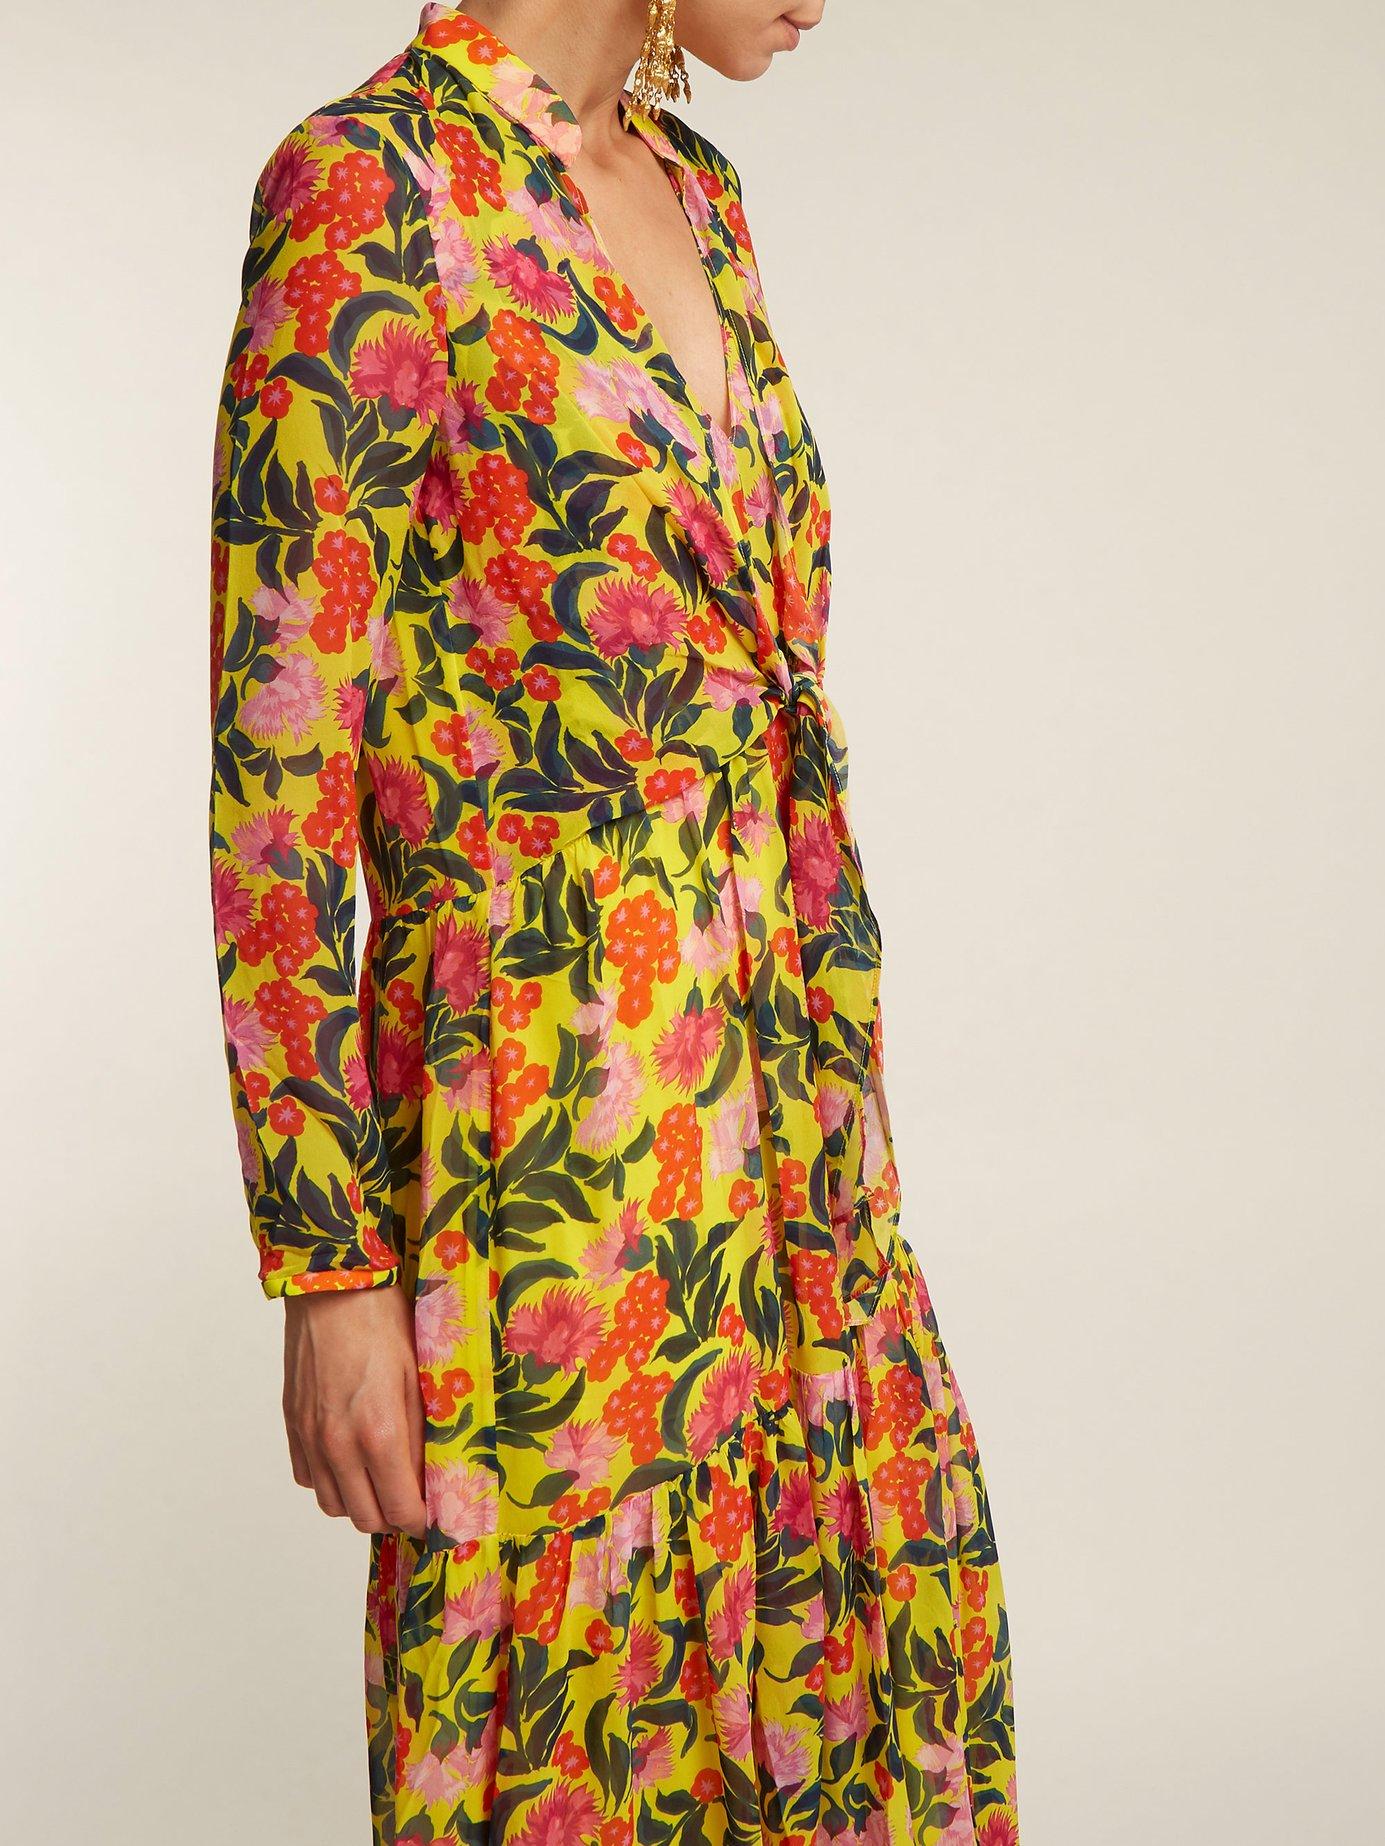 Alexia floral-print tie-front silk dress by Saloni